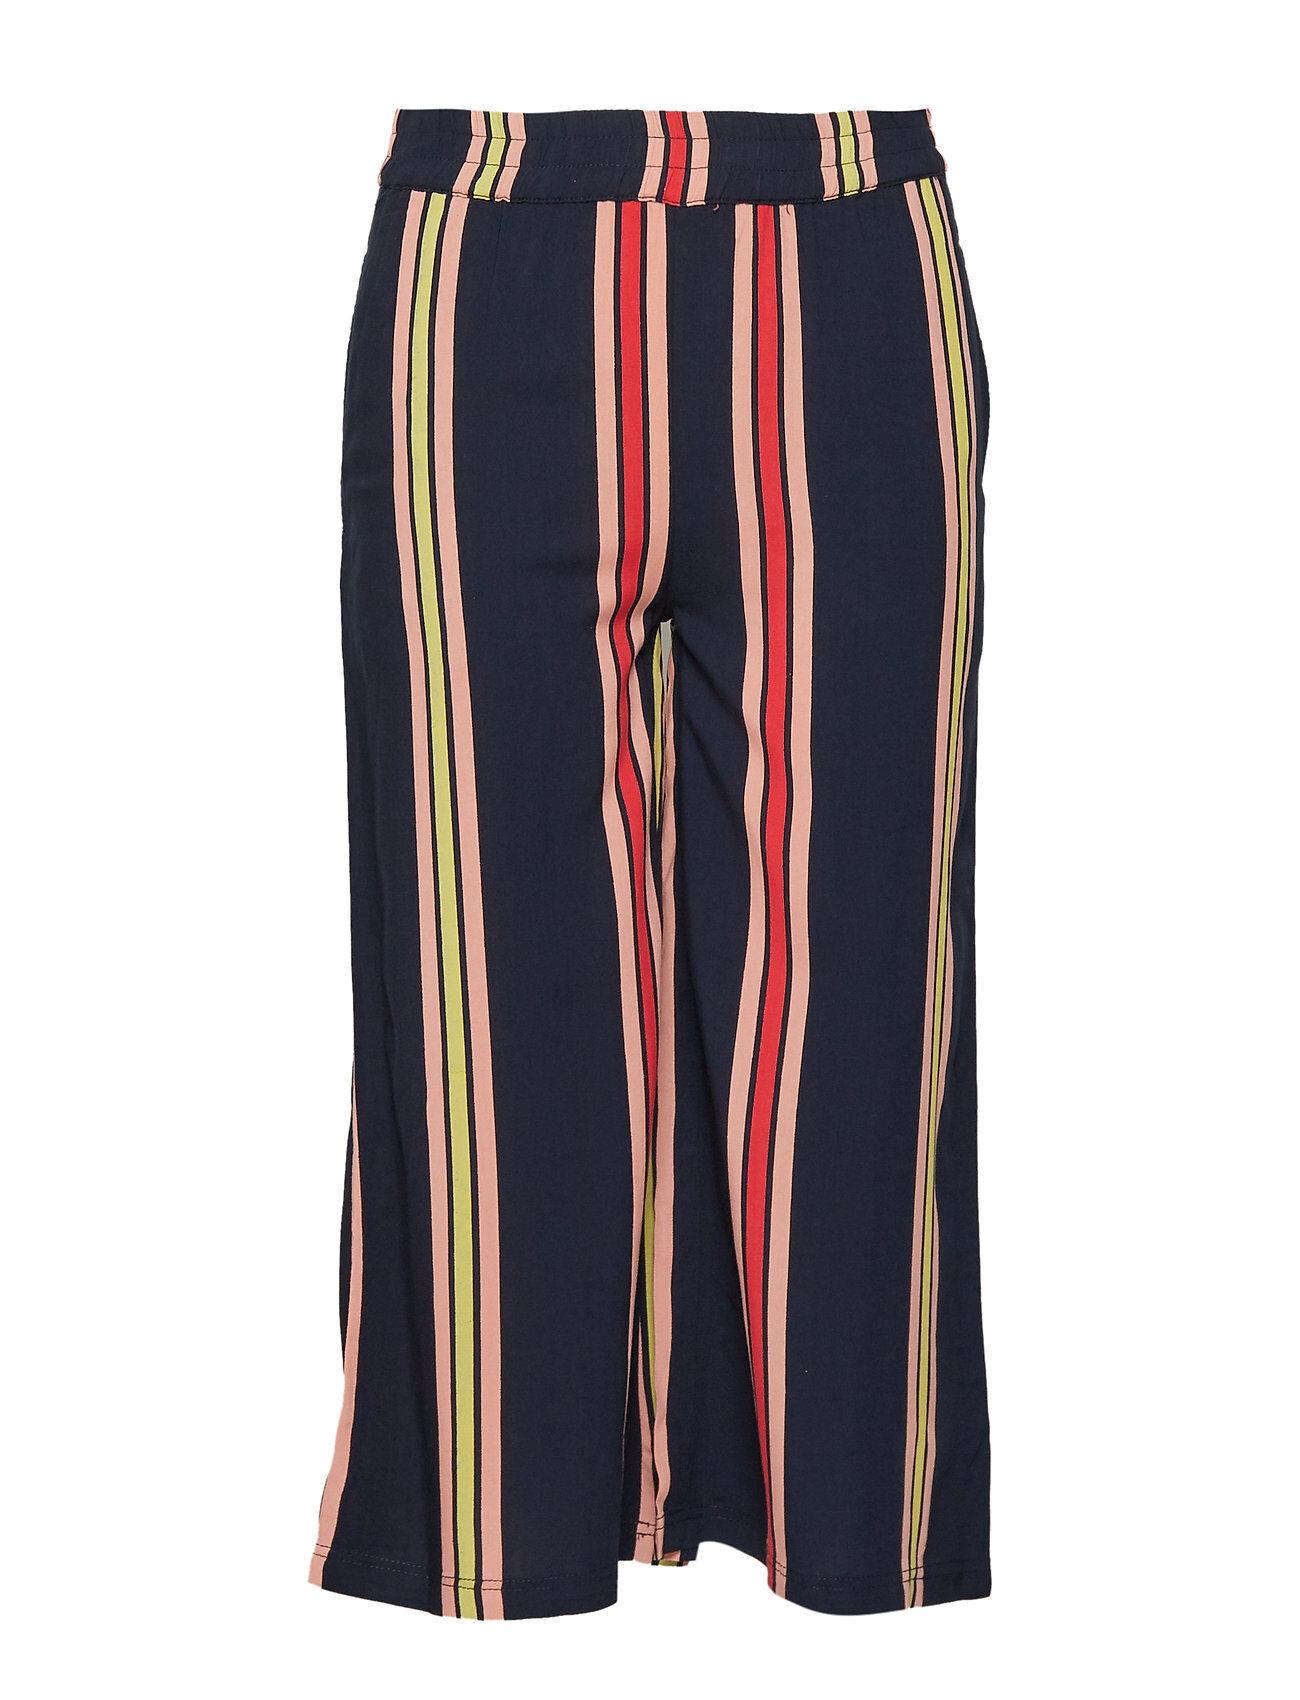 The New Lynn Pants